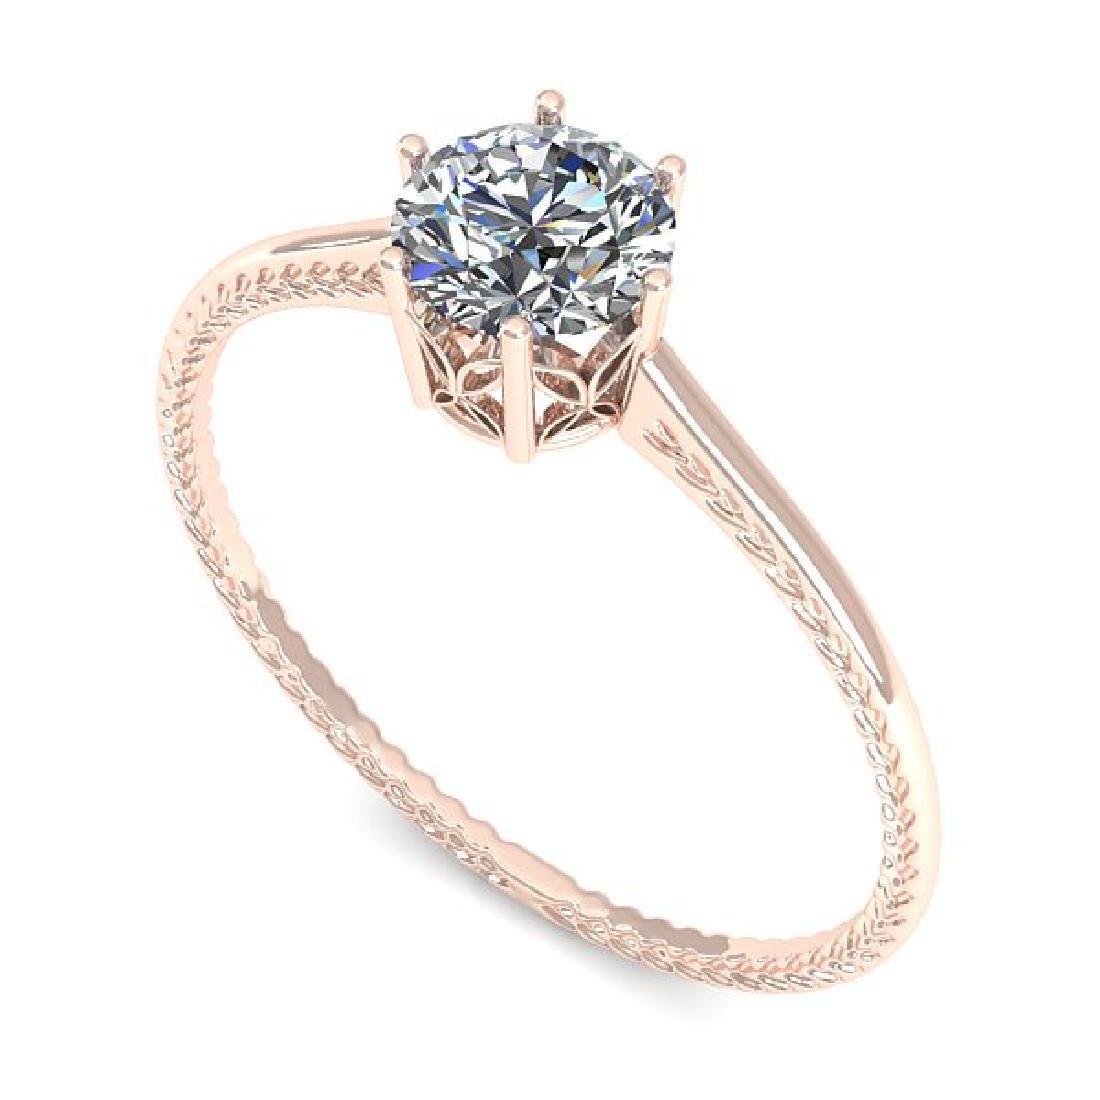 0.51 CTW VS/SI Diamond Art Deco Ring 14K Rose Gold - 2